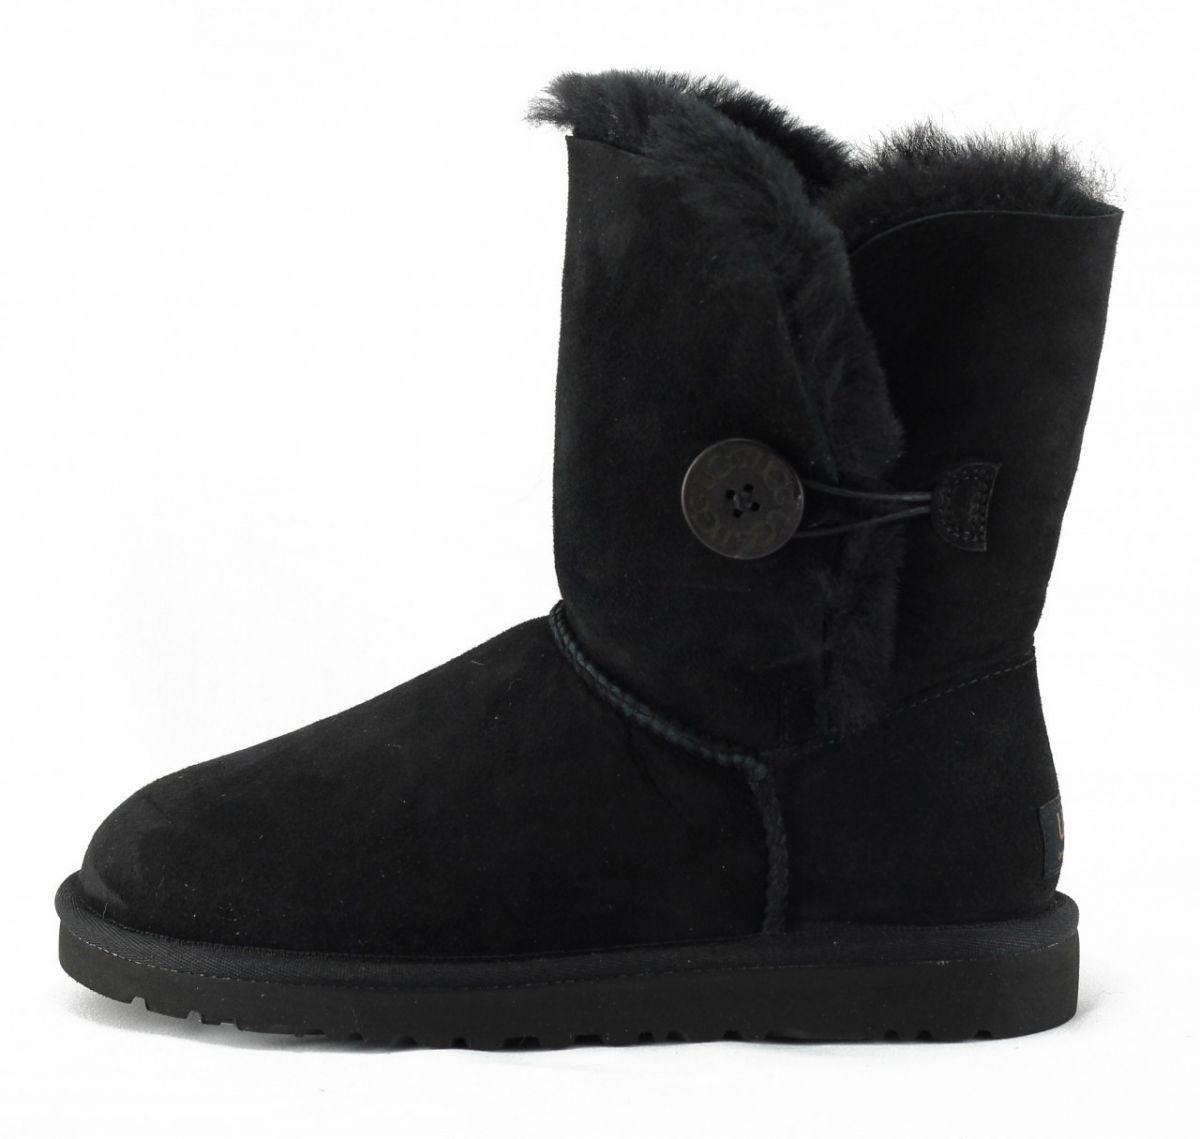 44bc5950762 UGG Australia for Women: Bailey Black Boots BLACK